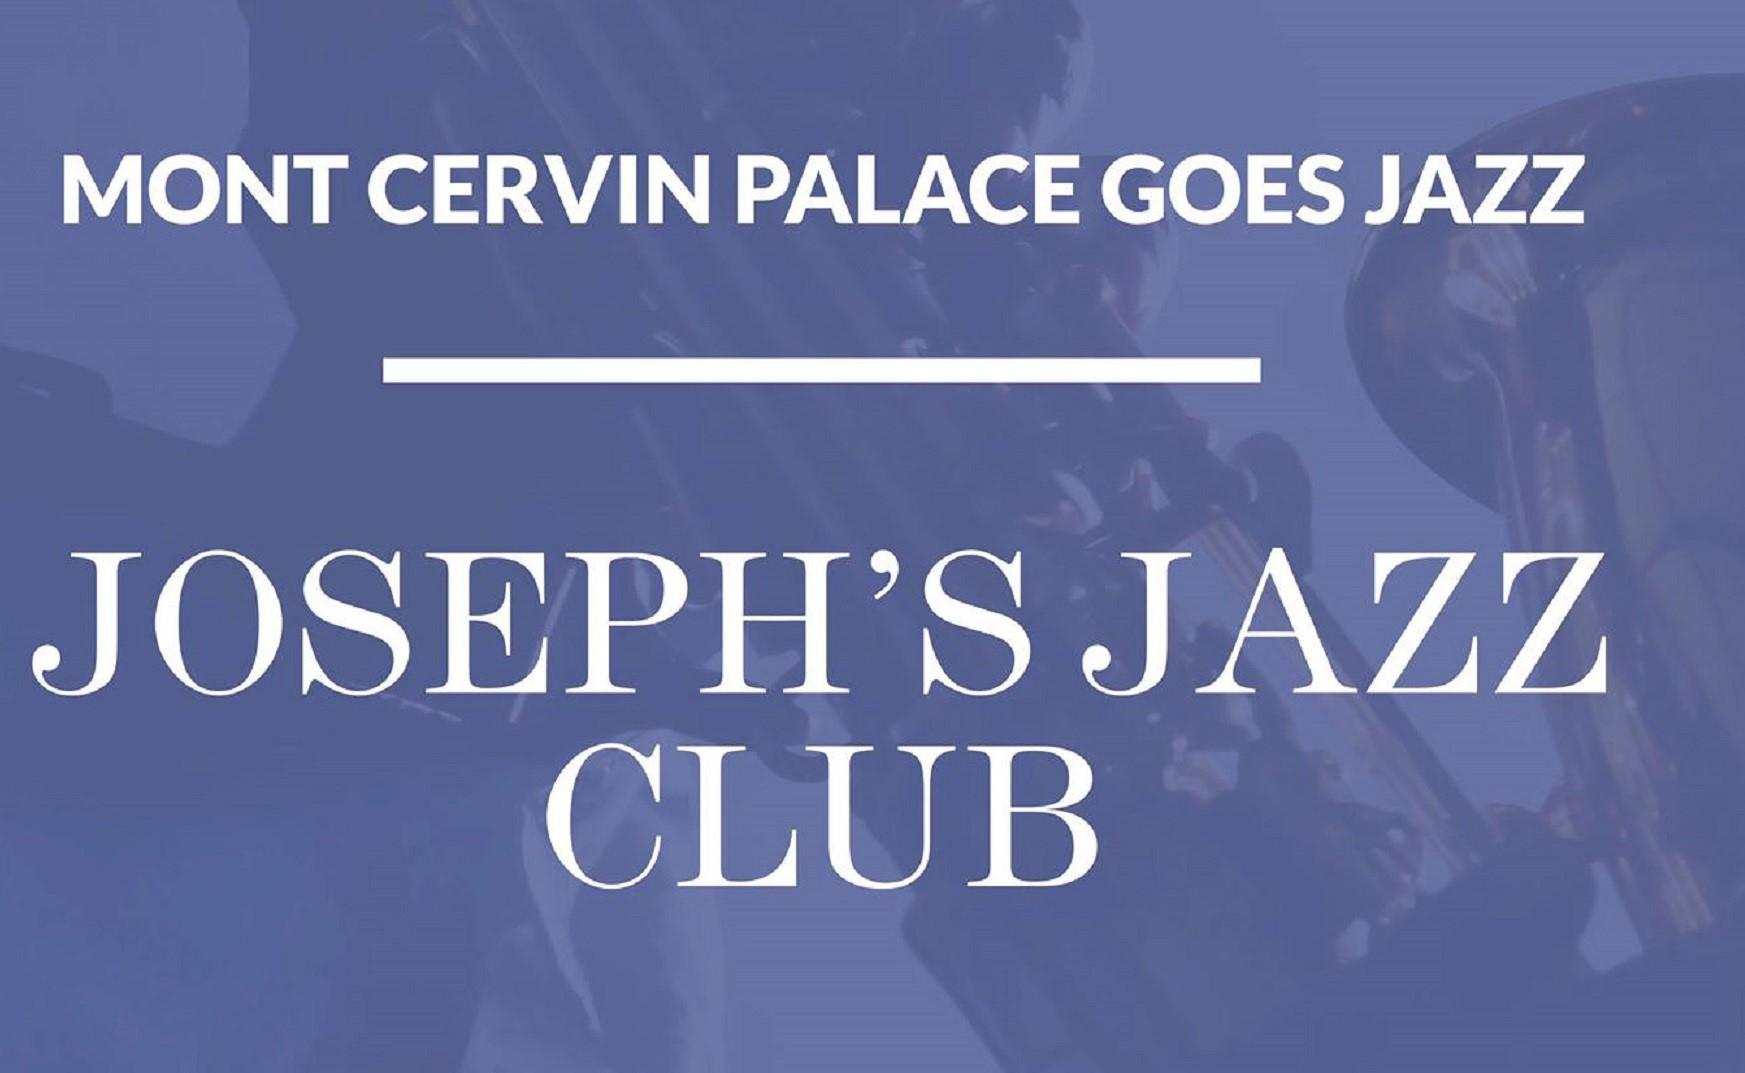 Joseph's Jazz Club